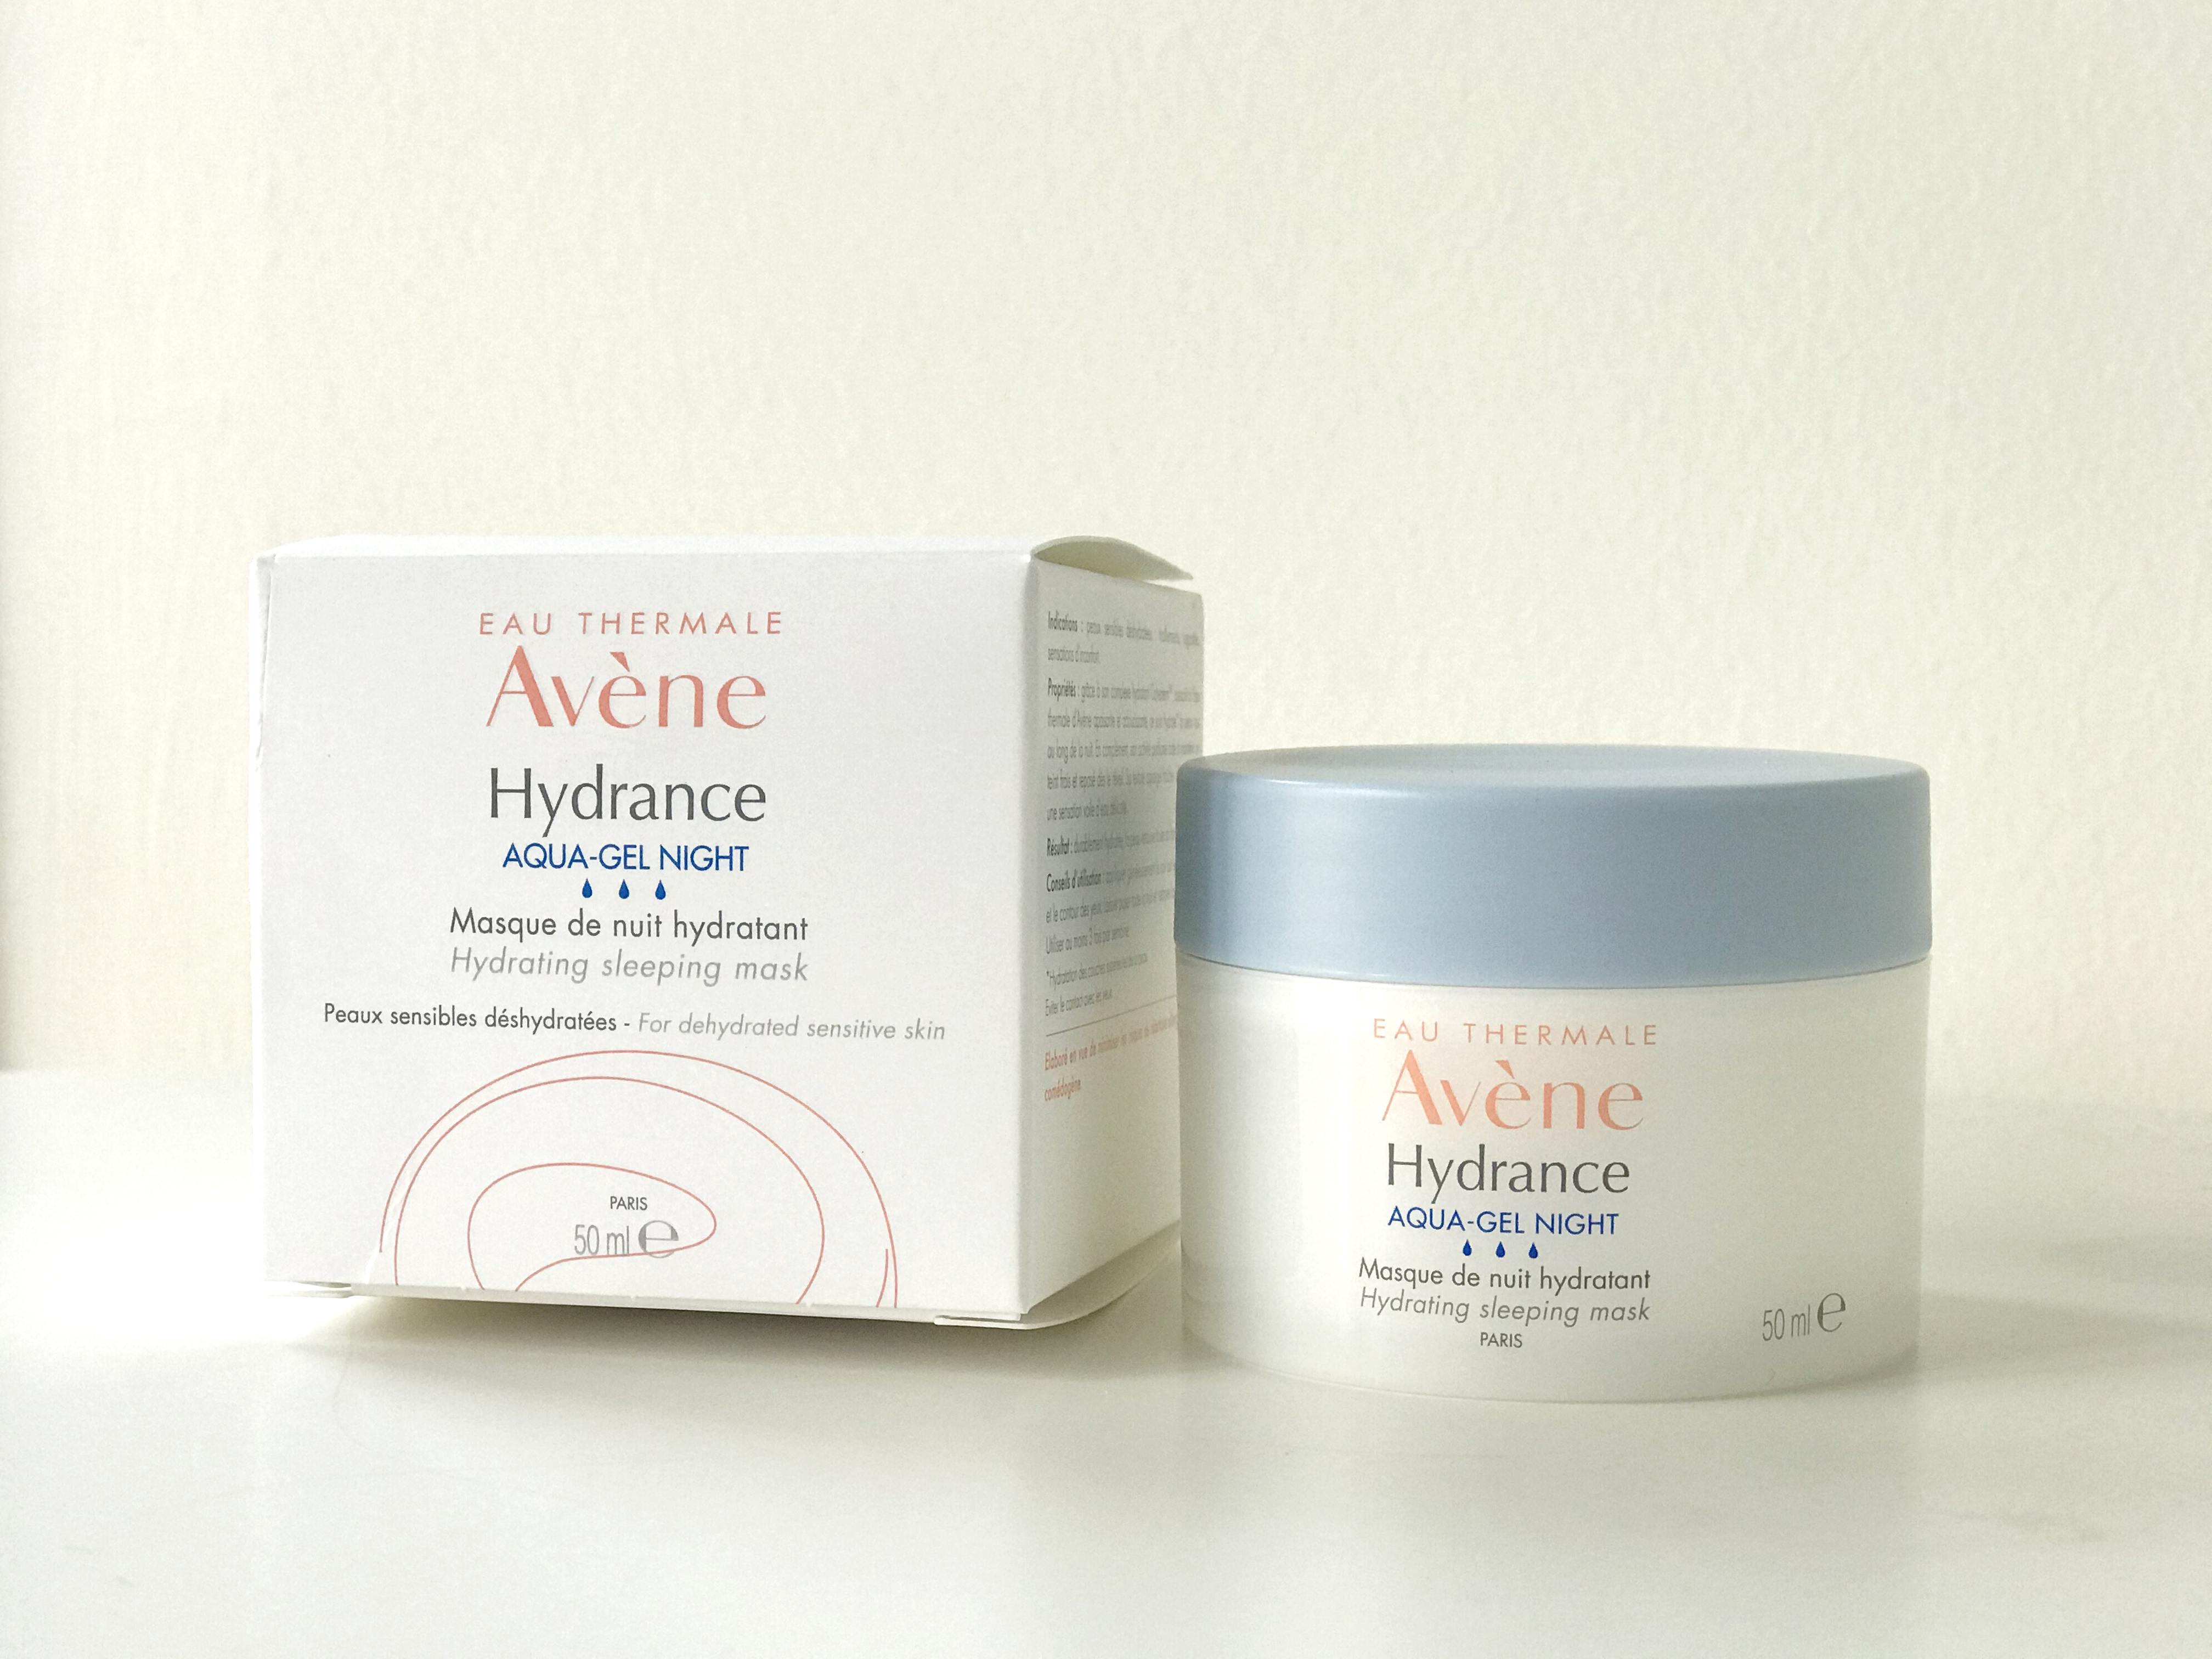 Avène Hydrance Aqua Gel Night Hydrating Sleeping Mask Review 2